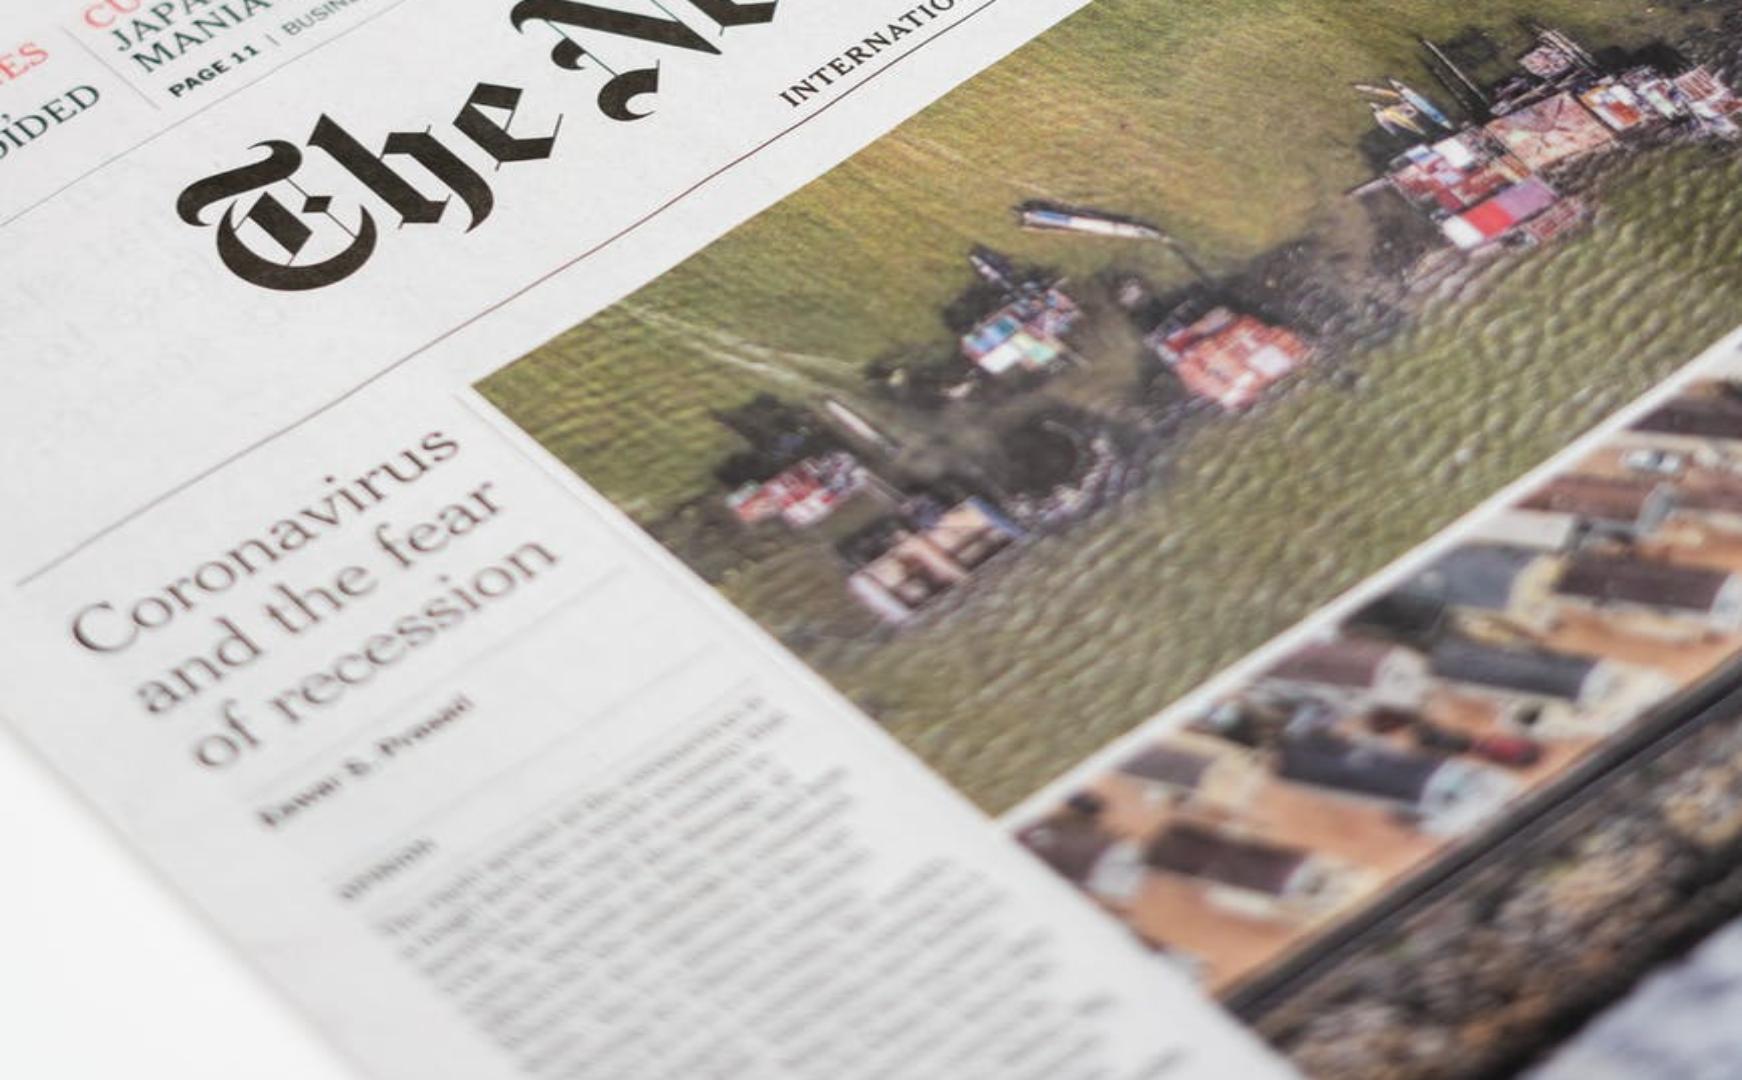 Newspaper of the Recession during Coronavirus